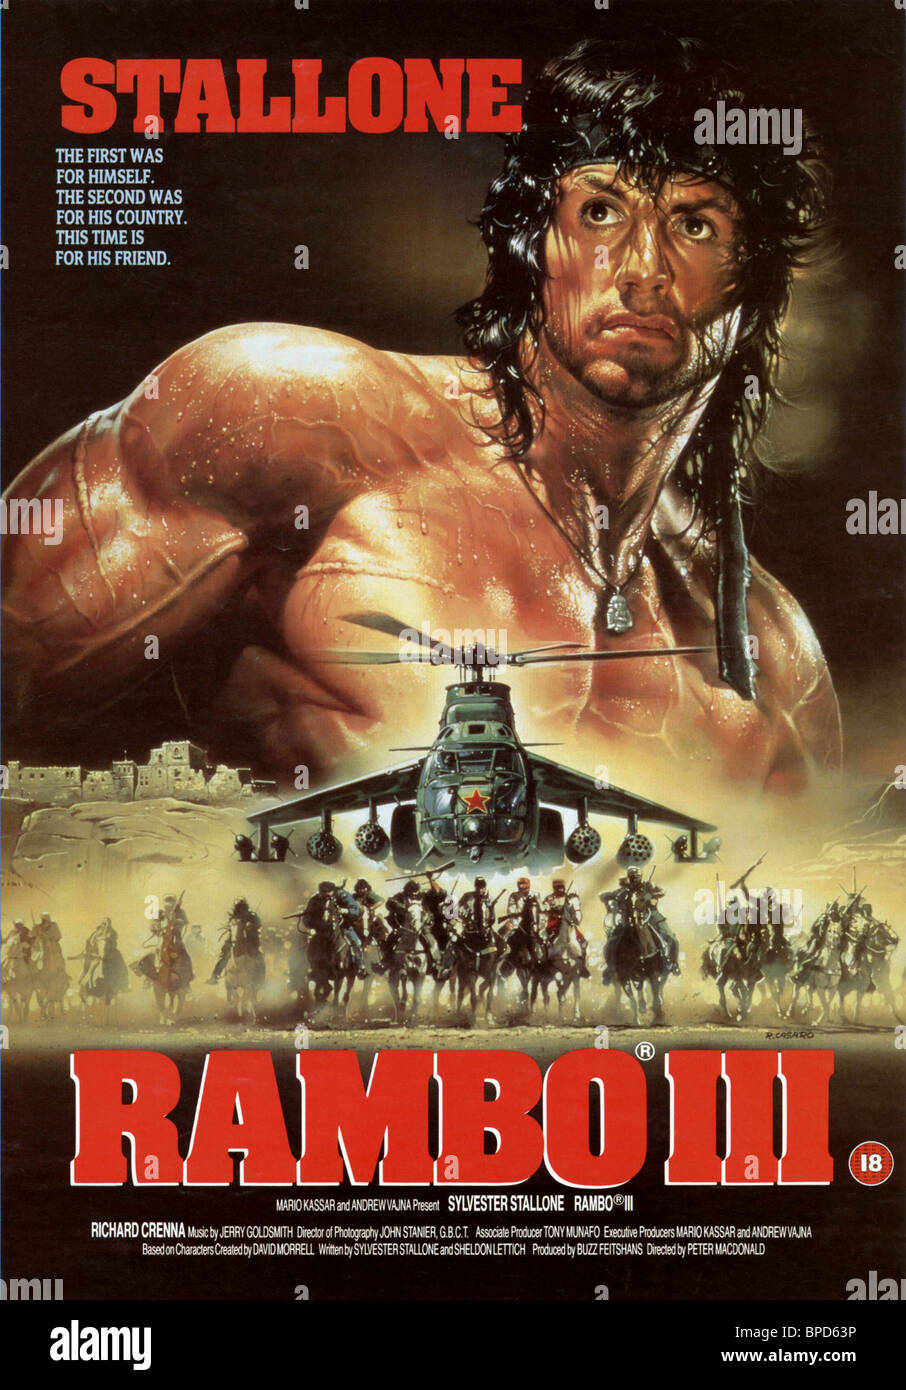 Sylvester Stallone Poster Rambo Iii 1988 Stock Photo Alamy